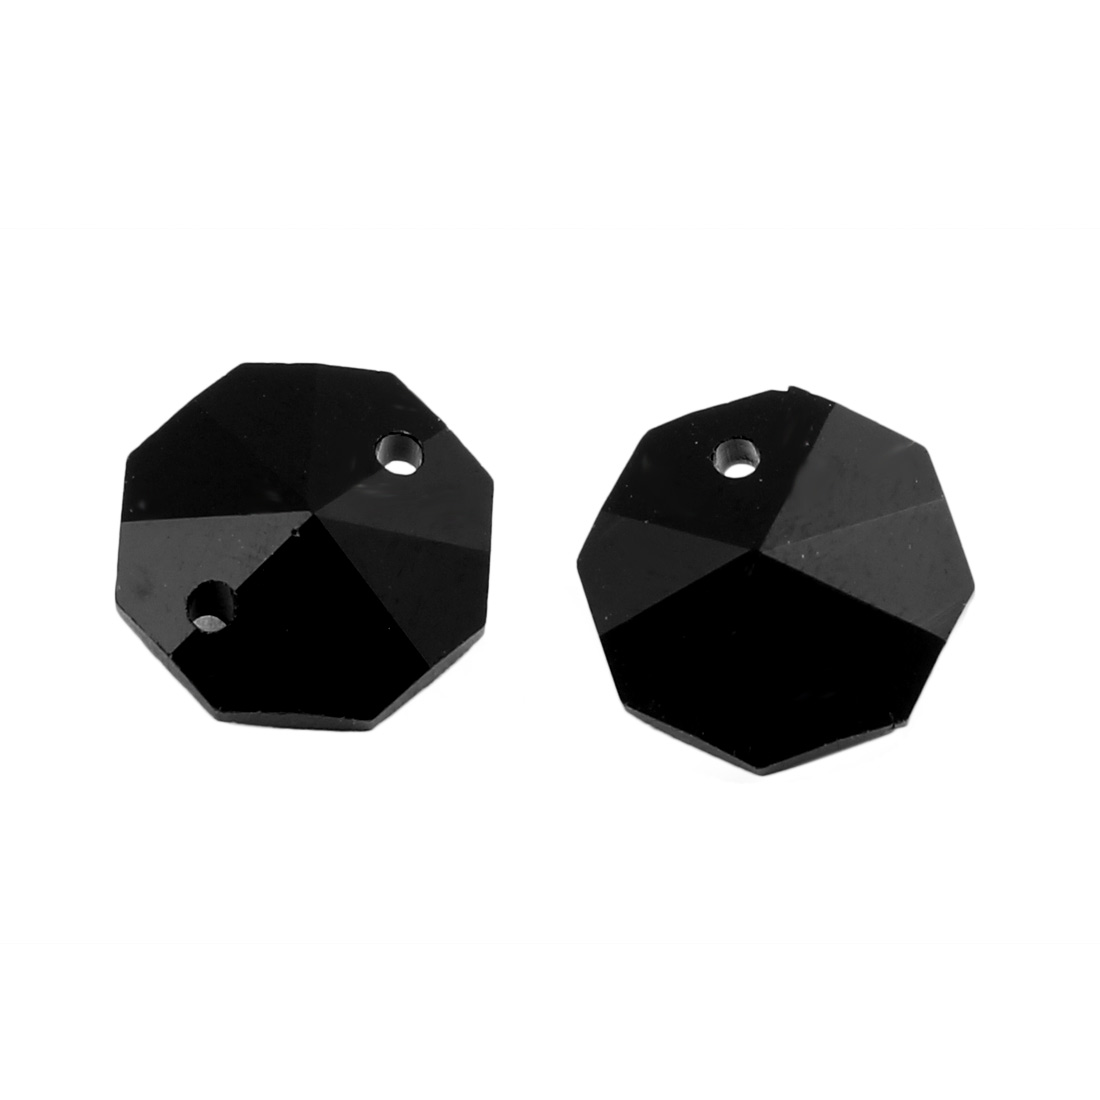 30pcs 14mmx14mm Octagonal Crystal Beads Black for DIY Light Accessories - image 1 de 2